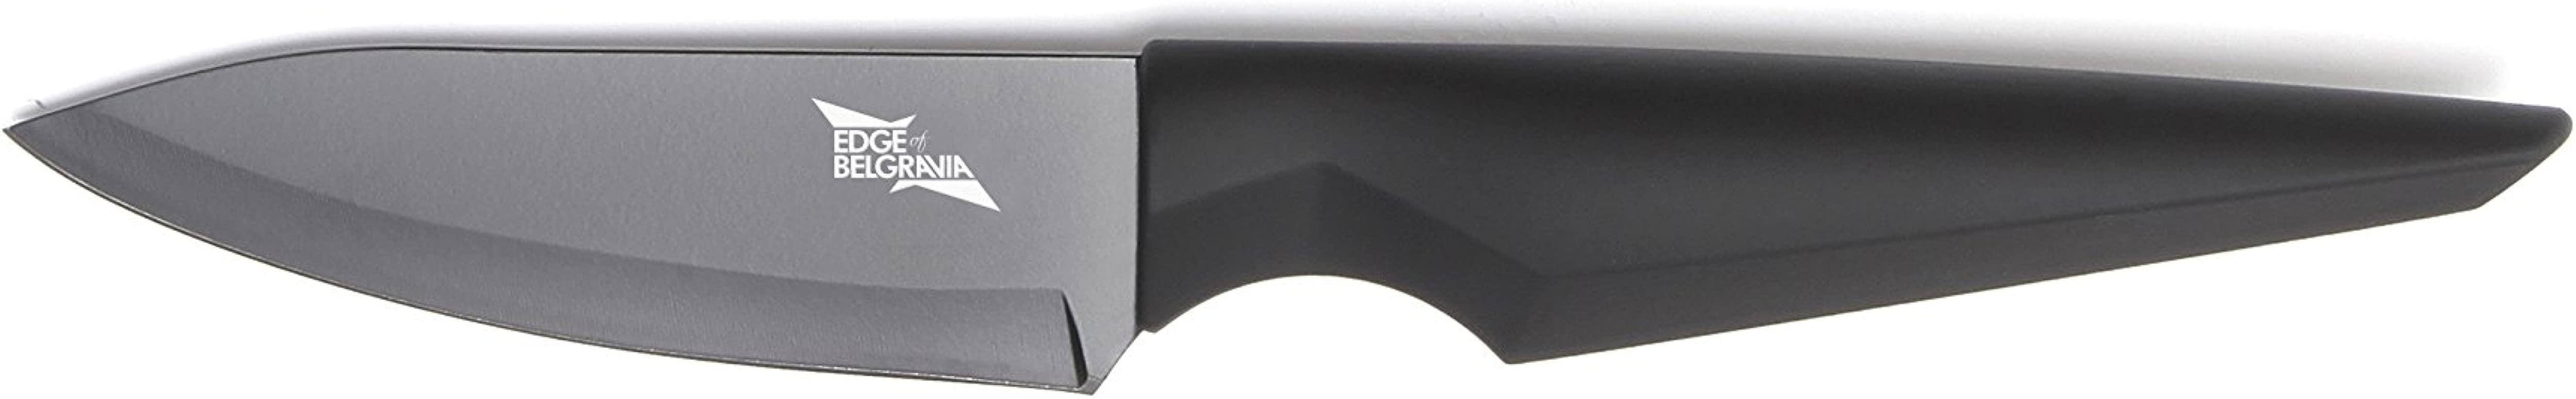 Edge Of Belgravia PRECISION Paring Knife 4 Non Stick Stainless Steel Blade